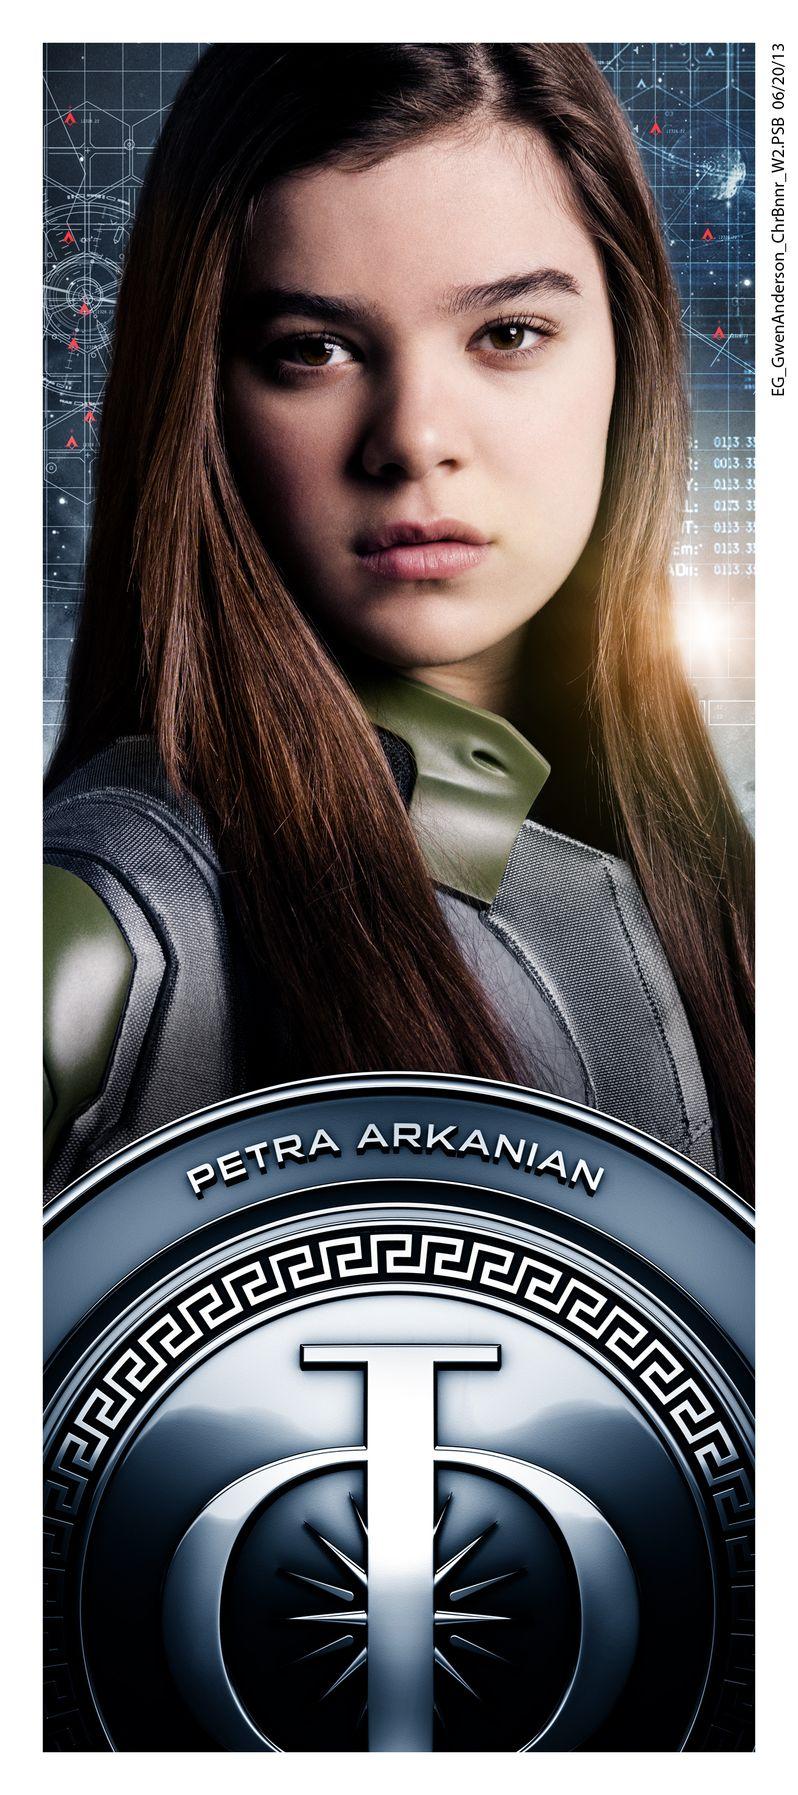 <strong><em>Ender's Game</em></strong> Hailee Steinfeld Character Poster